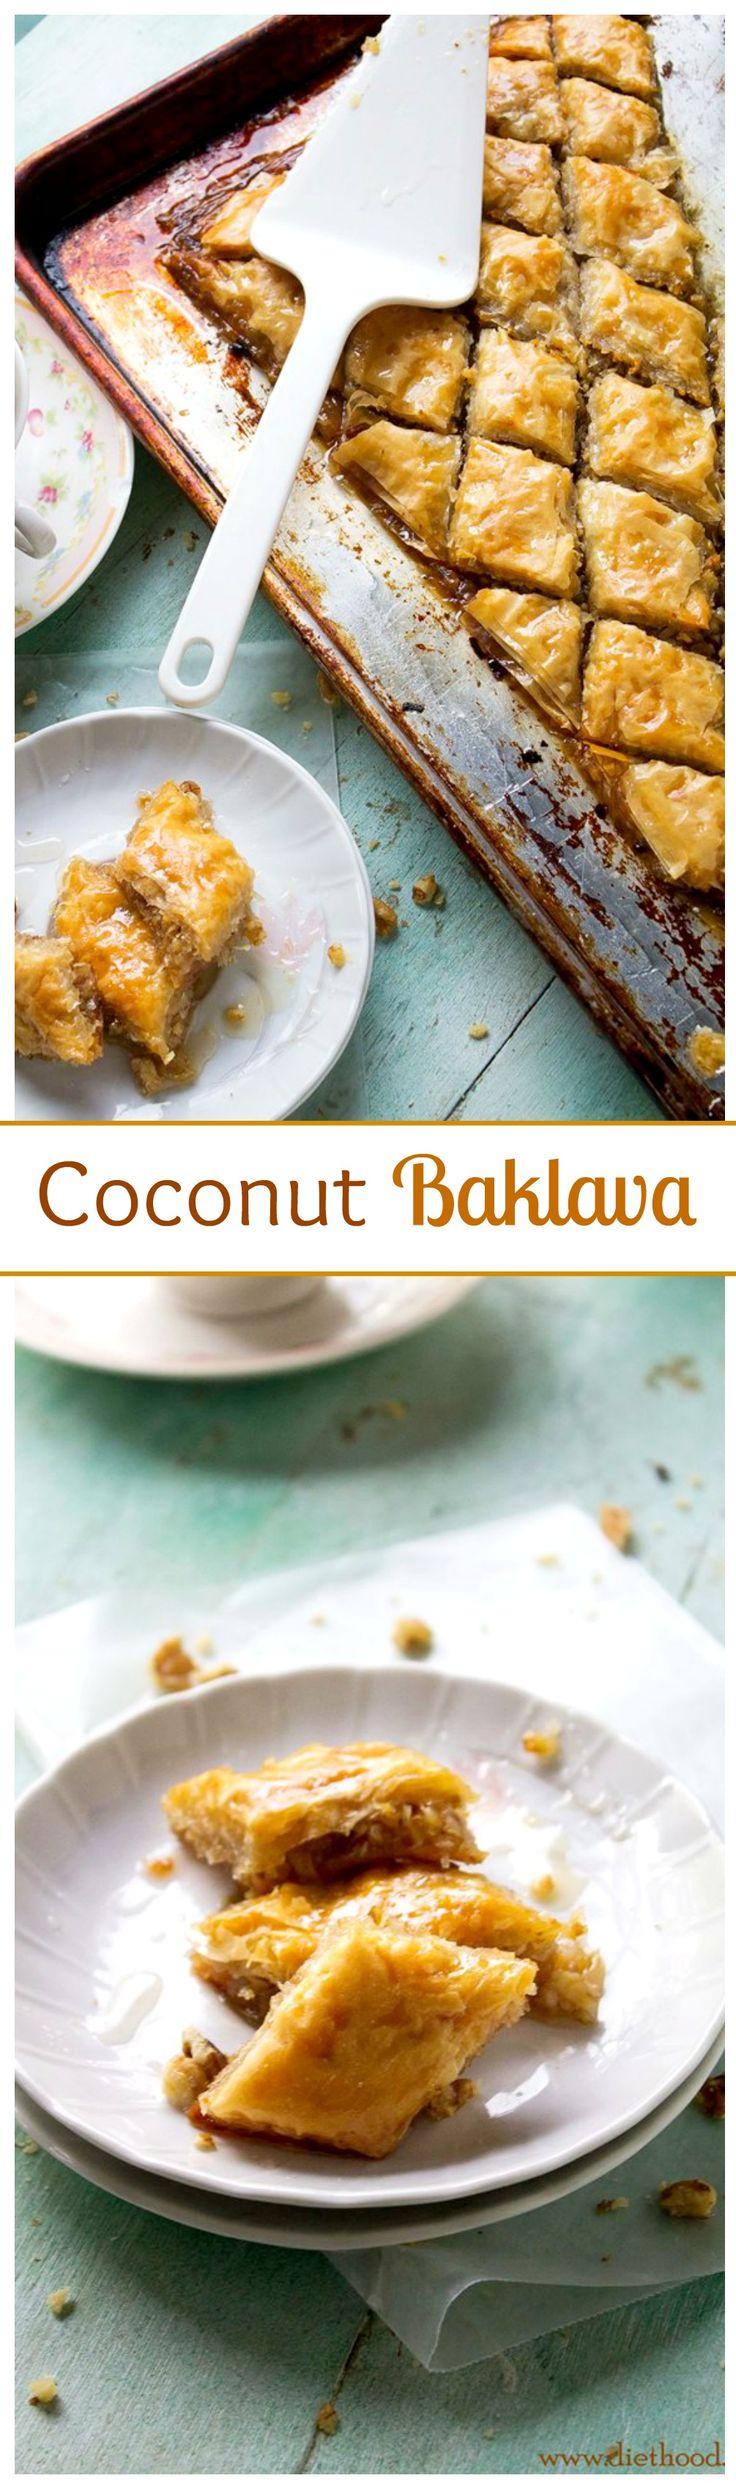 Coconut Baklava